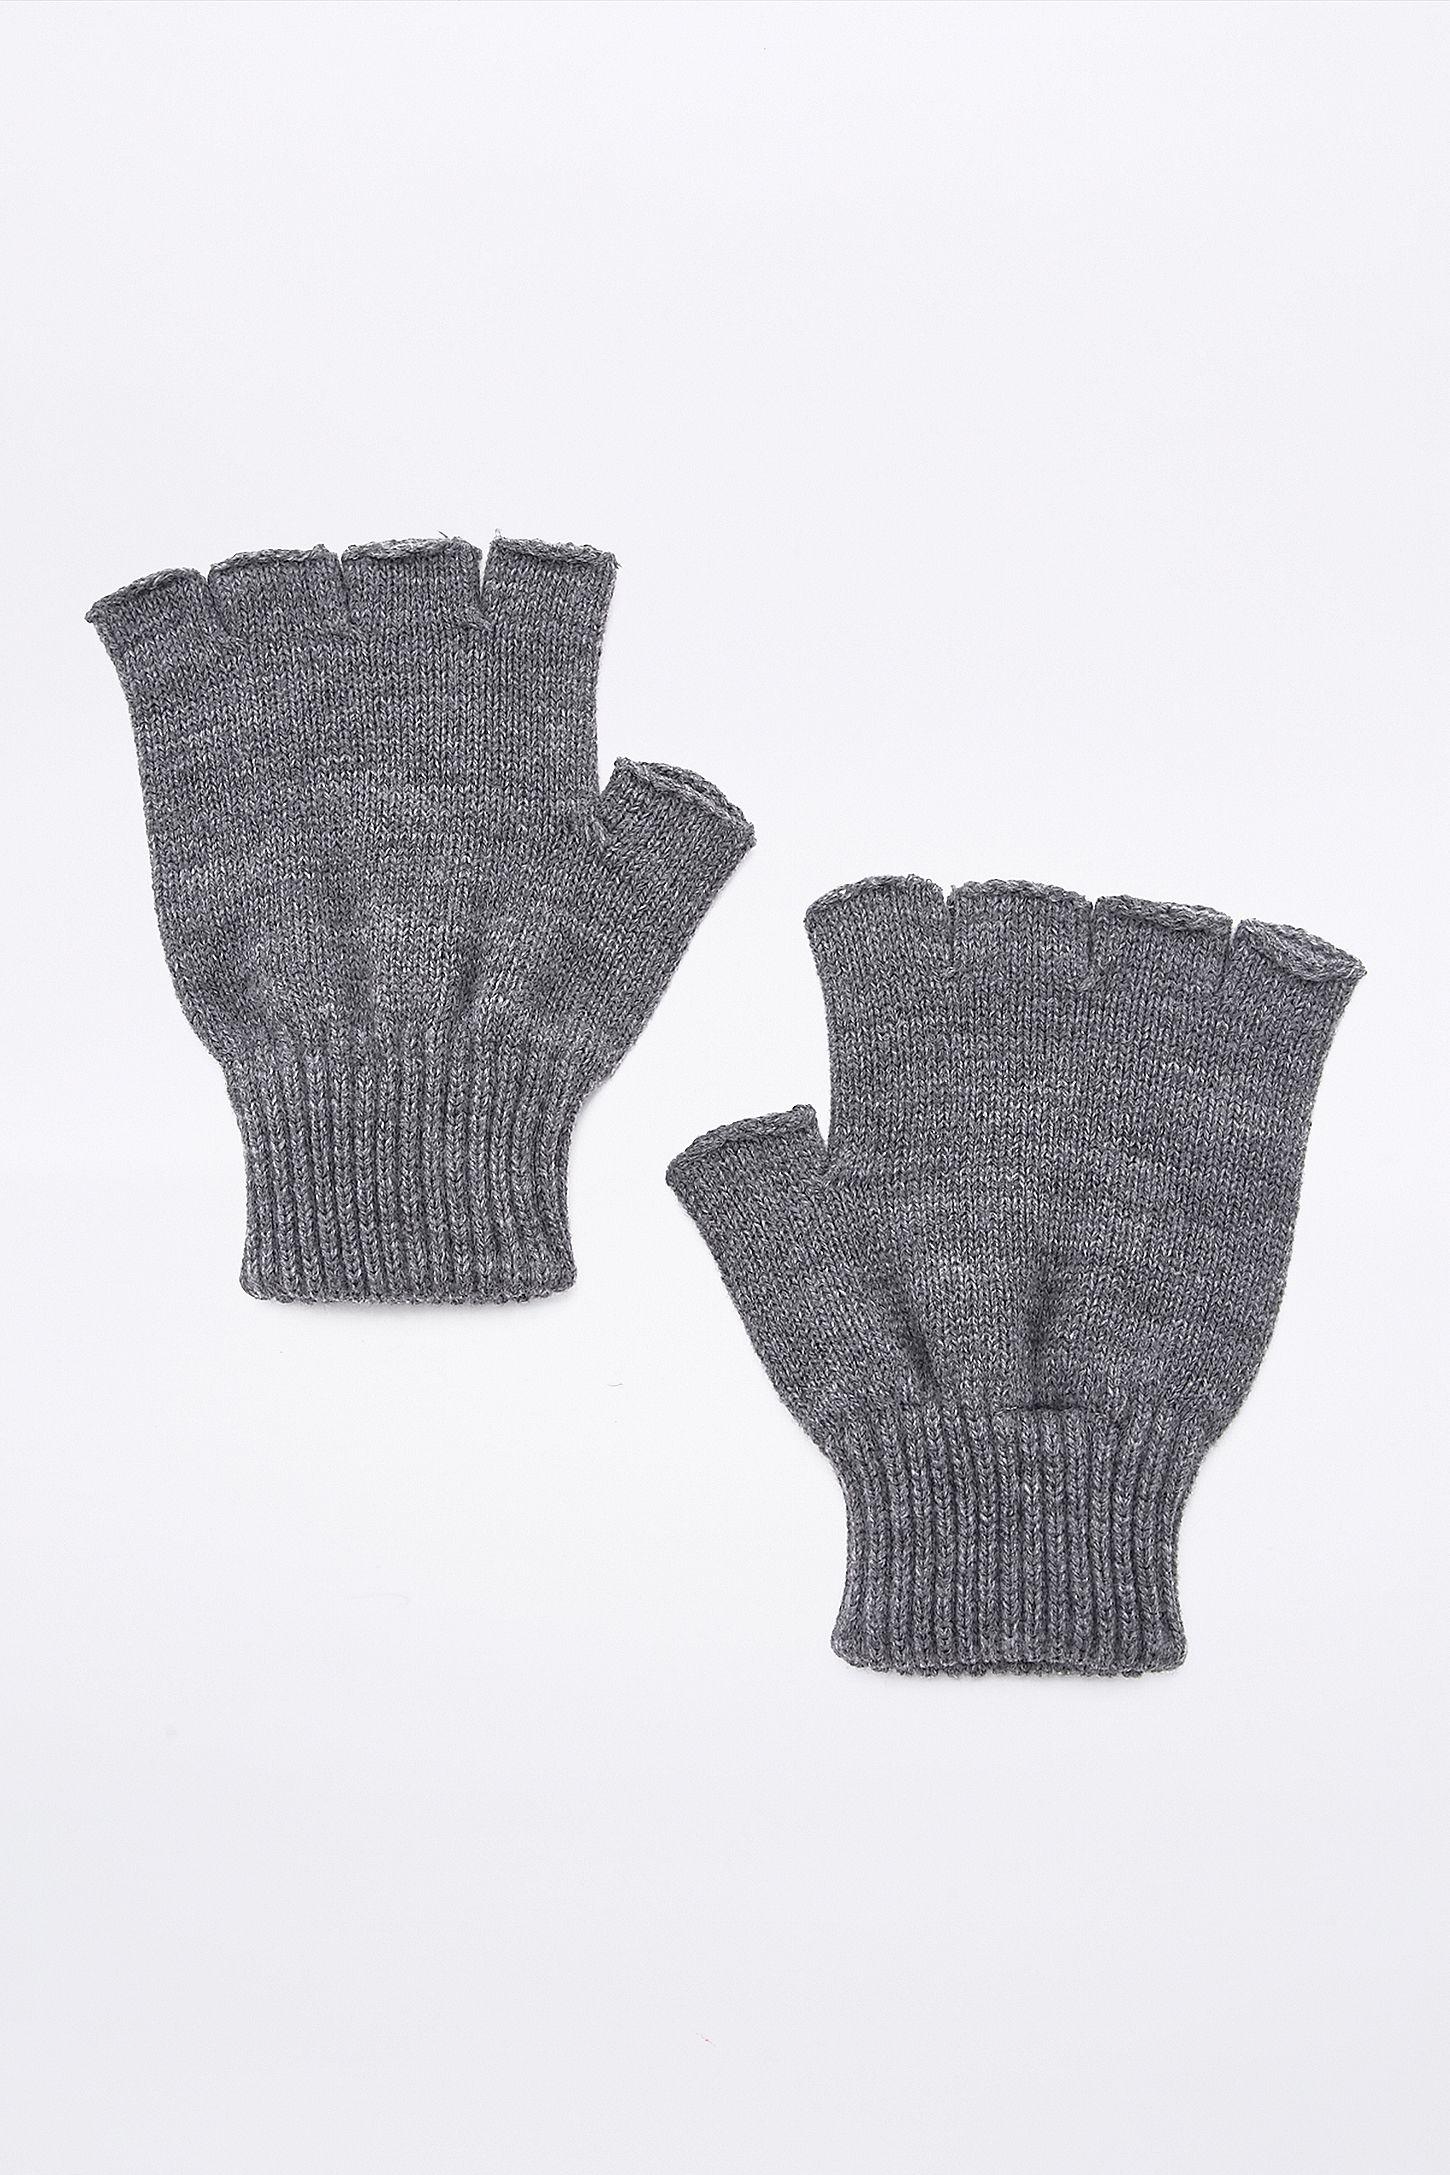 Grey Fingerless Gloves | Urban Outfitters UK